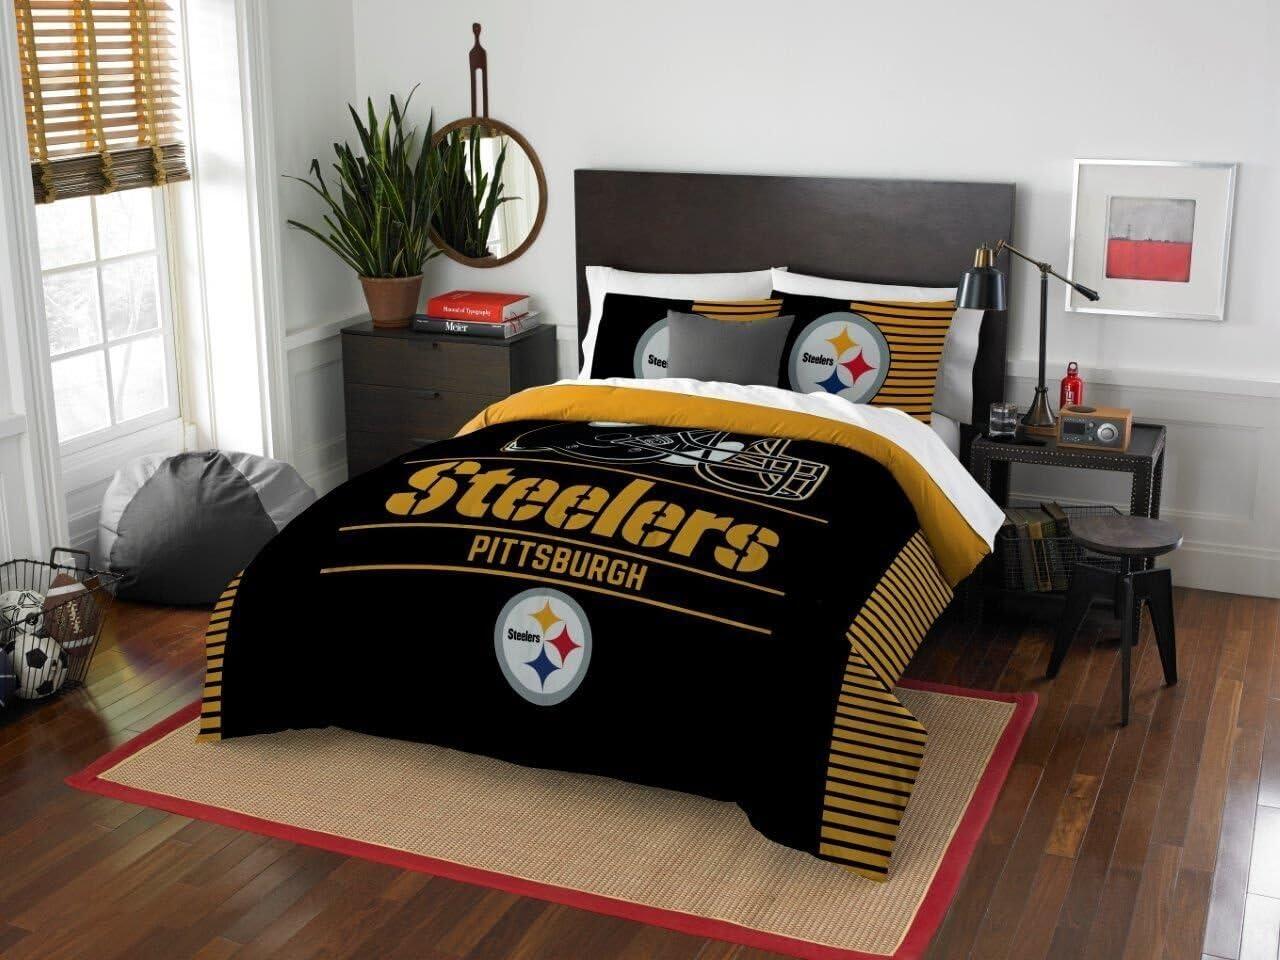 "Pittsburgh Steelers - 3 Piece FULL / QUEEN Size Printed Comforter Set - Entire Set Includes: 1 Full / Queen Comforter (86"" x 86"") & 2 Pillow Shams - NFL Football Bedding Bedroom Accessories"